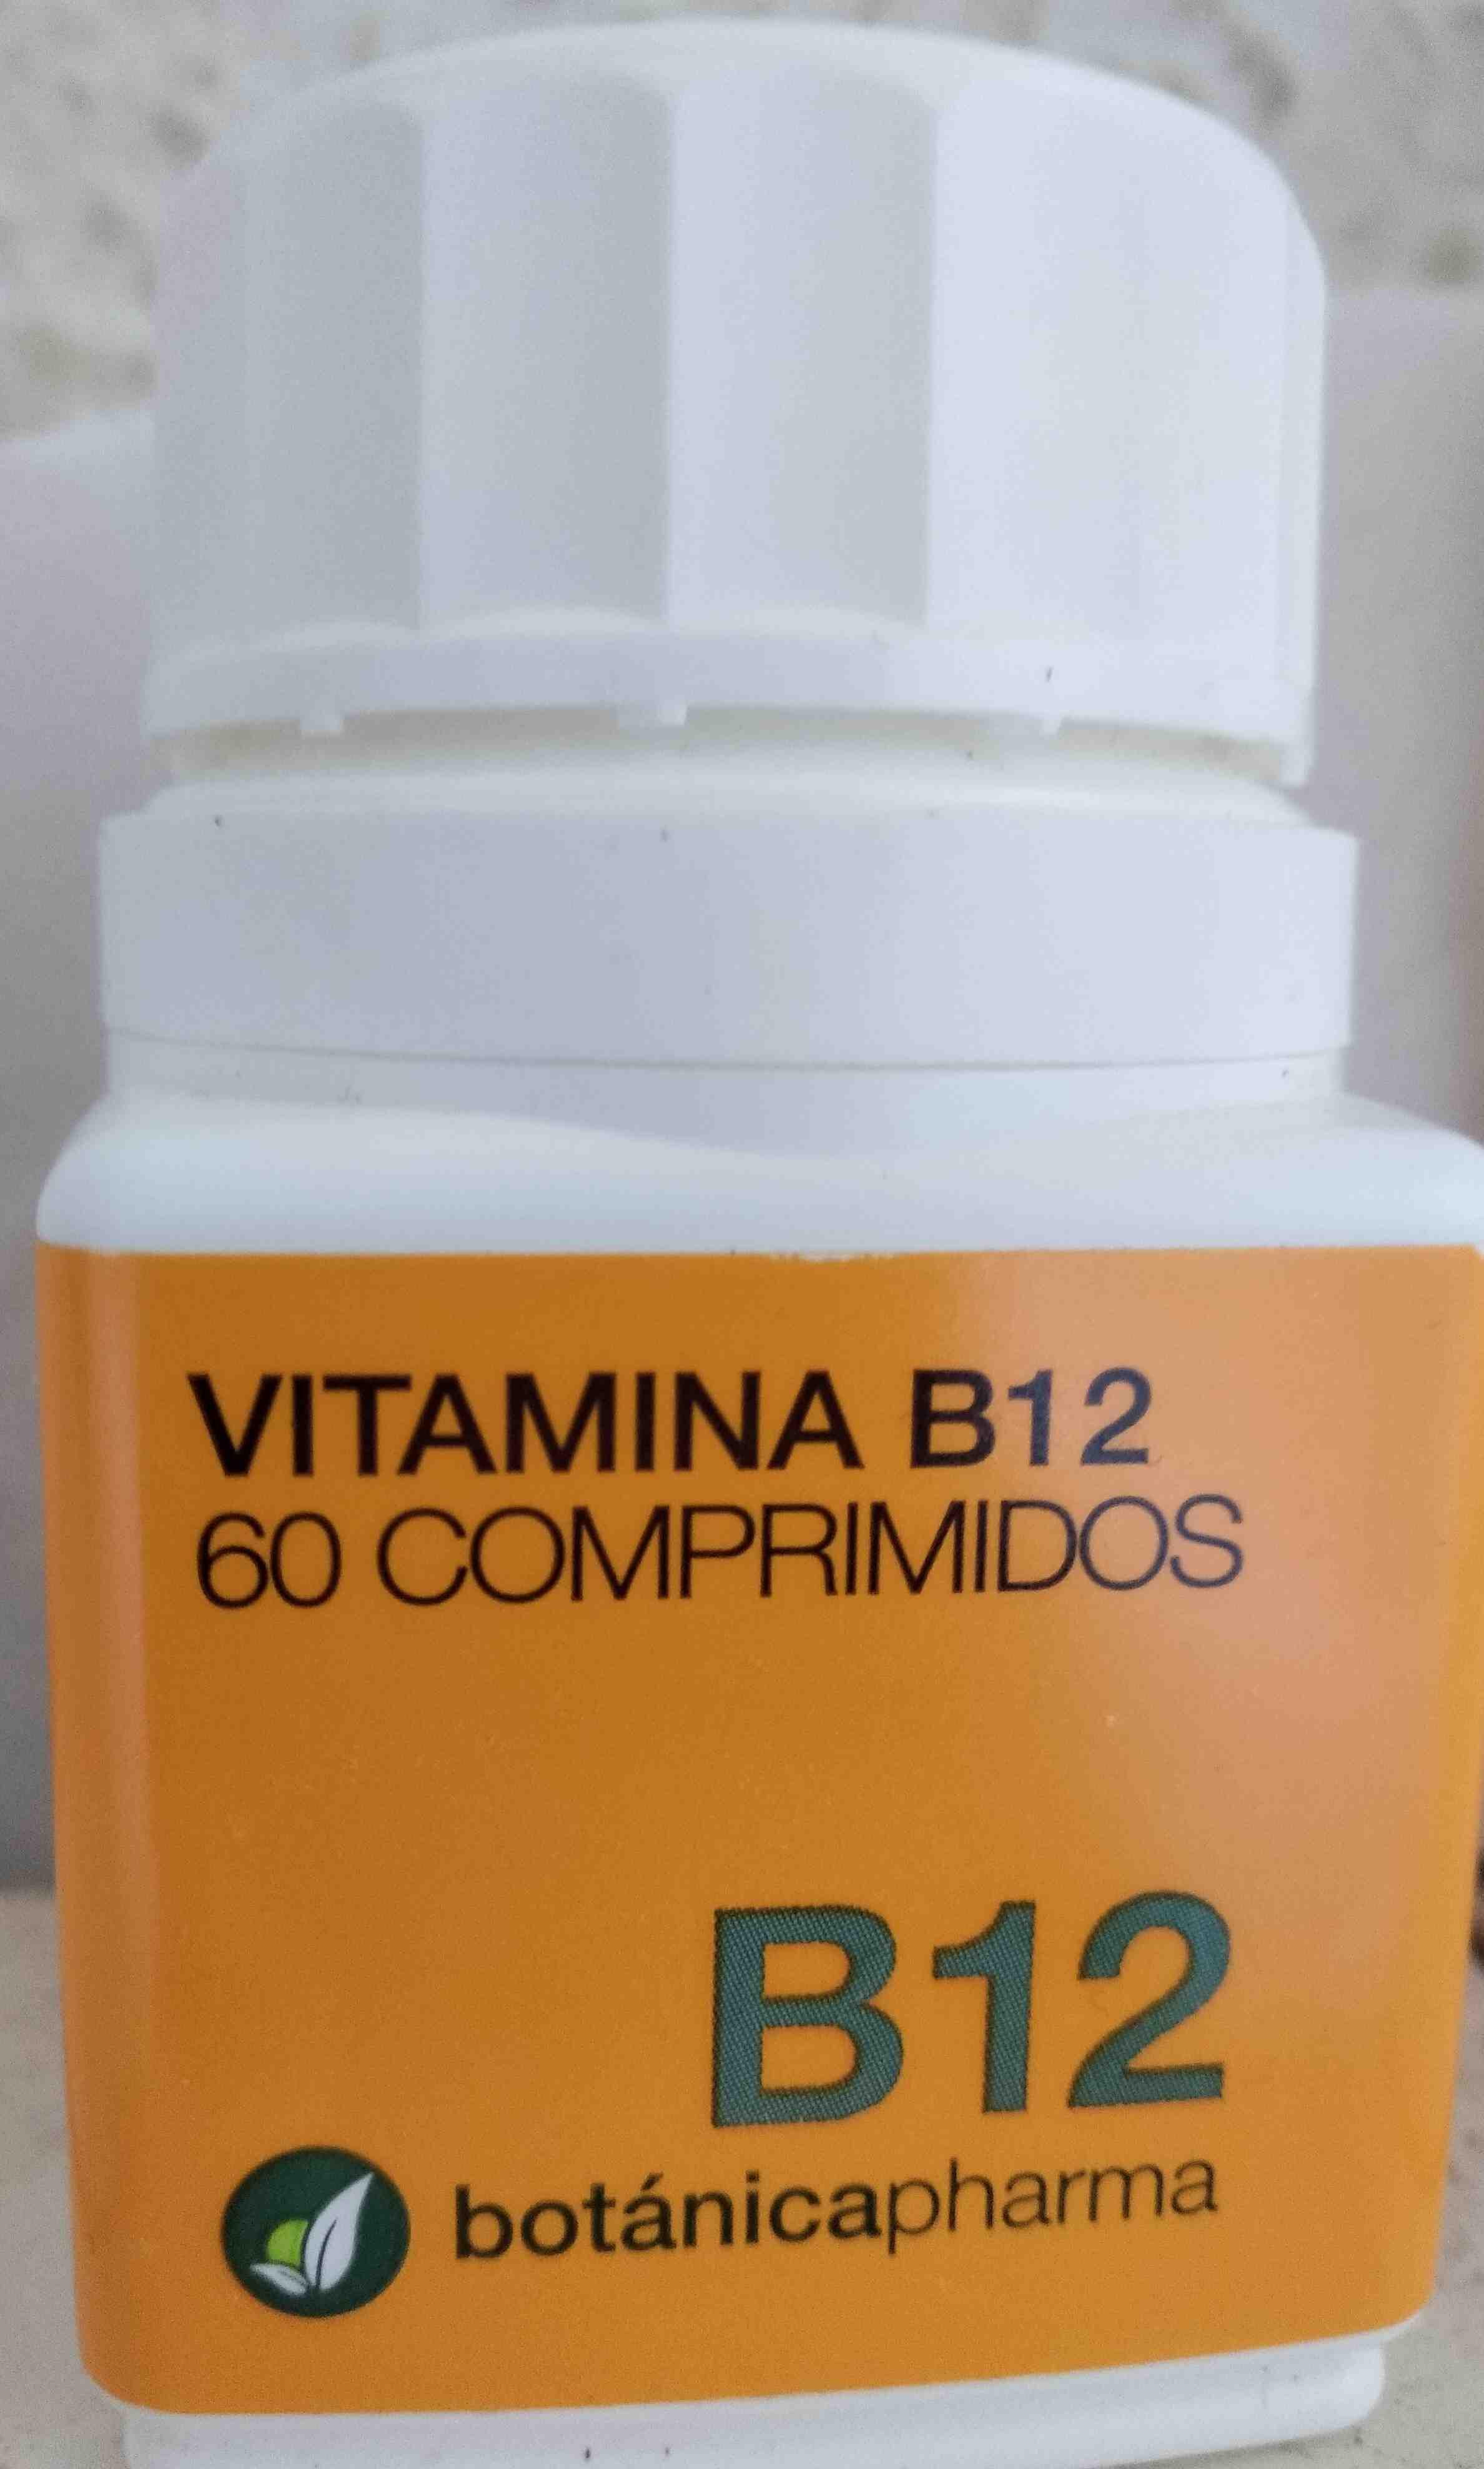 b 12 botanicapharma - Product - en